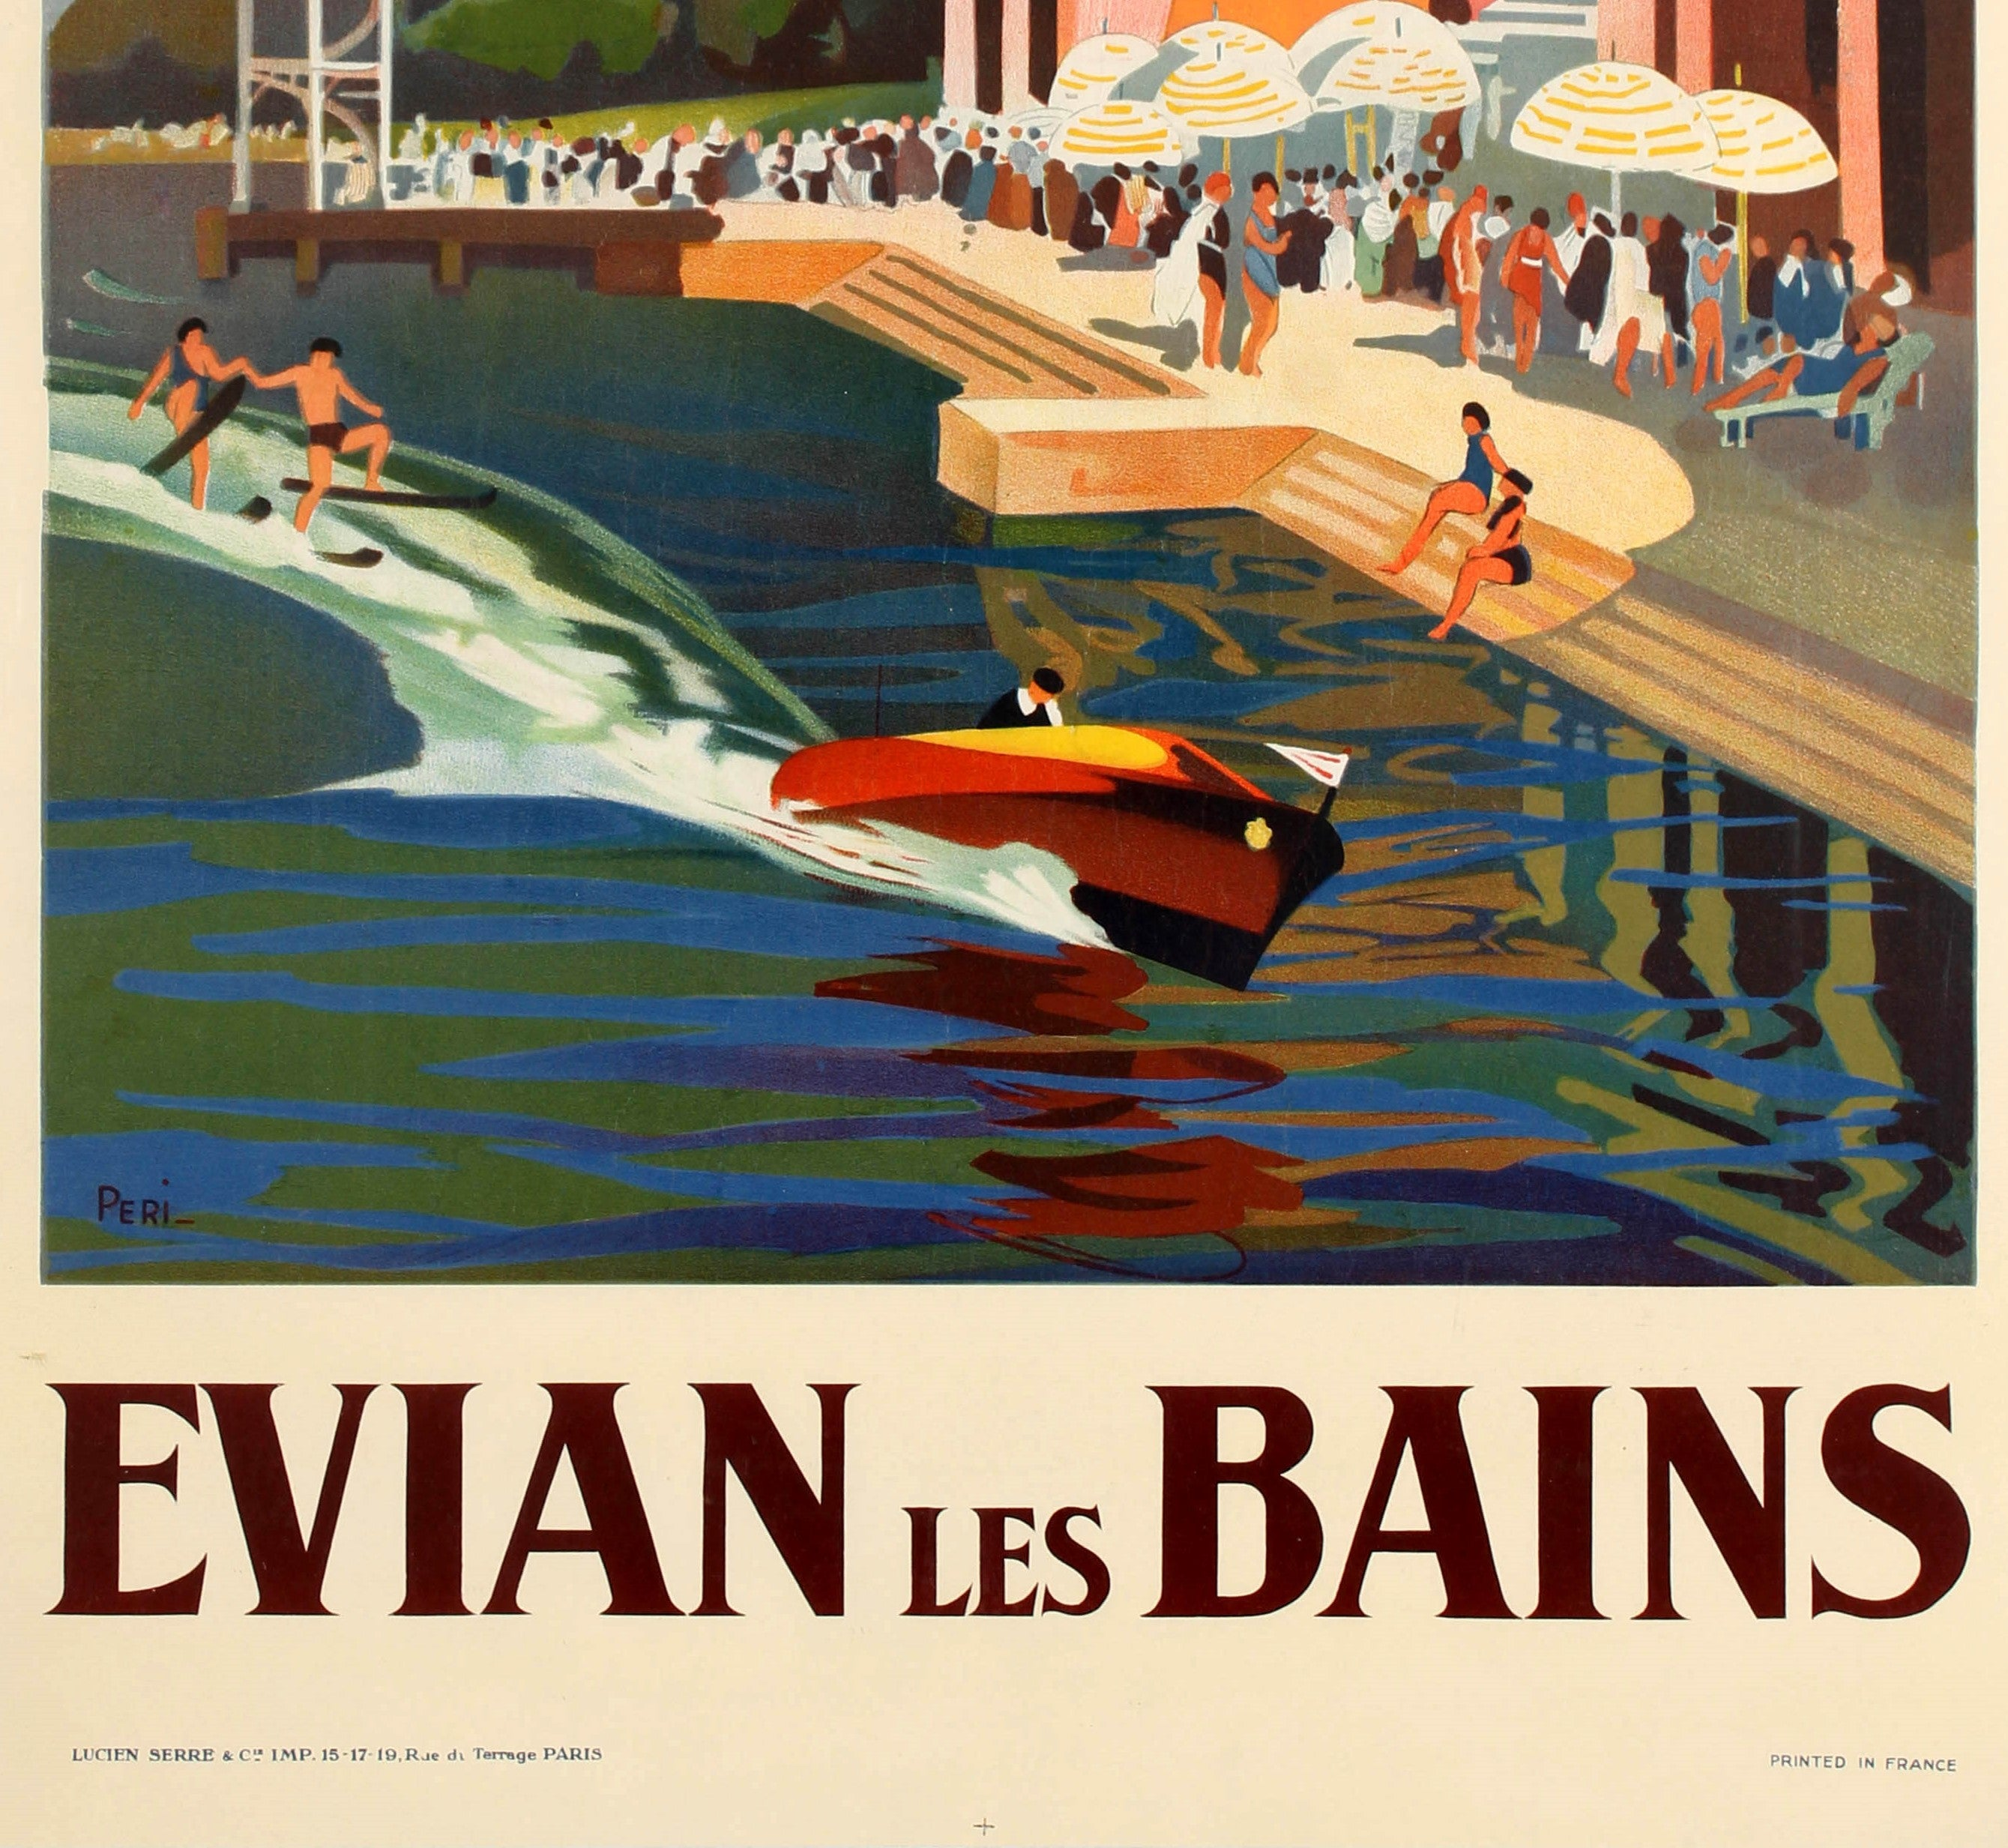 FRANCE VINTAGE TRAVEL POSTER Evian les Bains RARE NEW